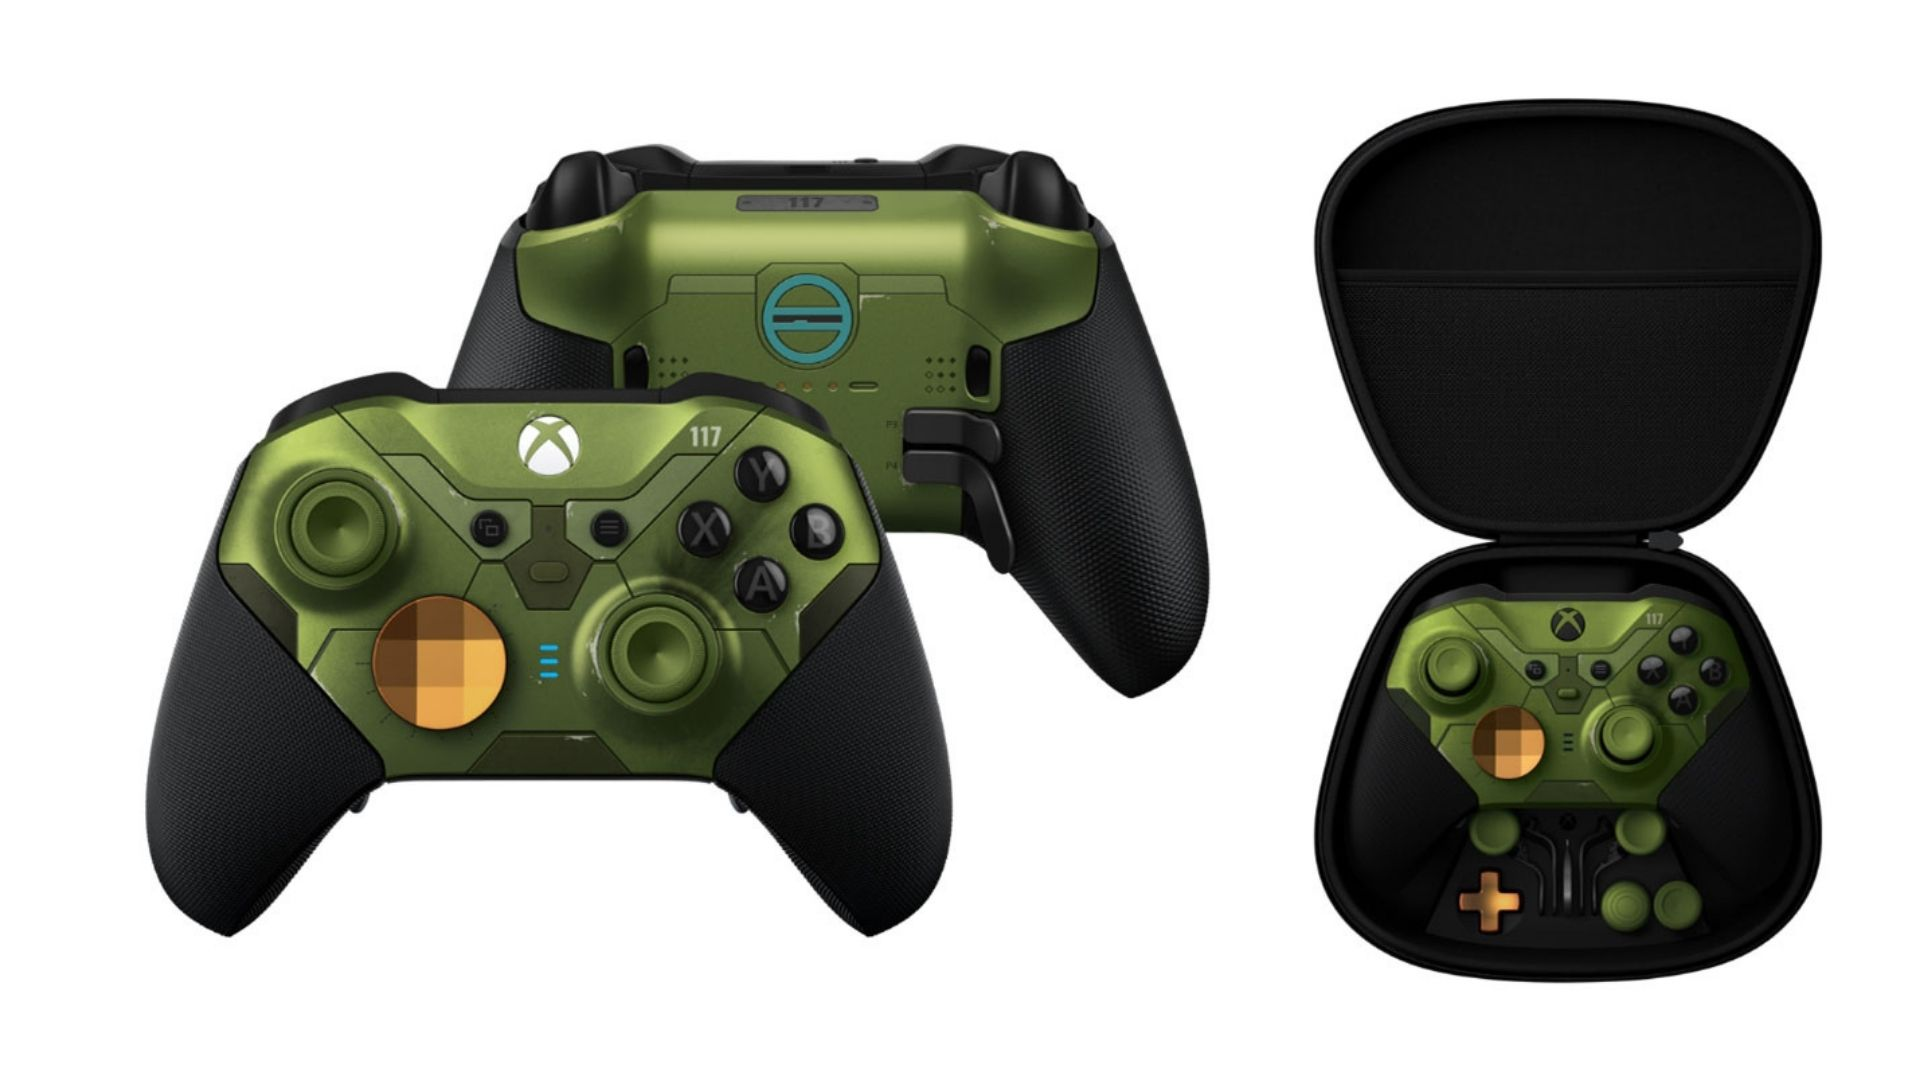 Halo Limited Edition Gamepad